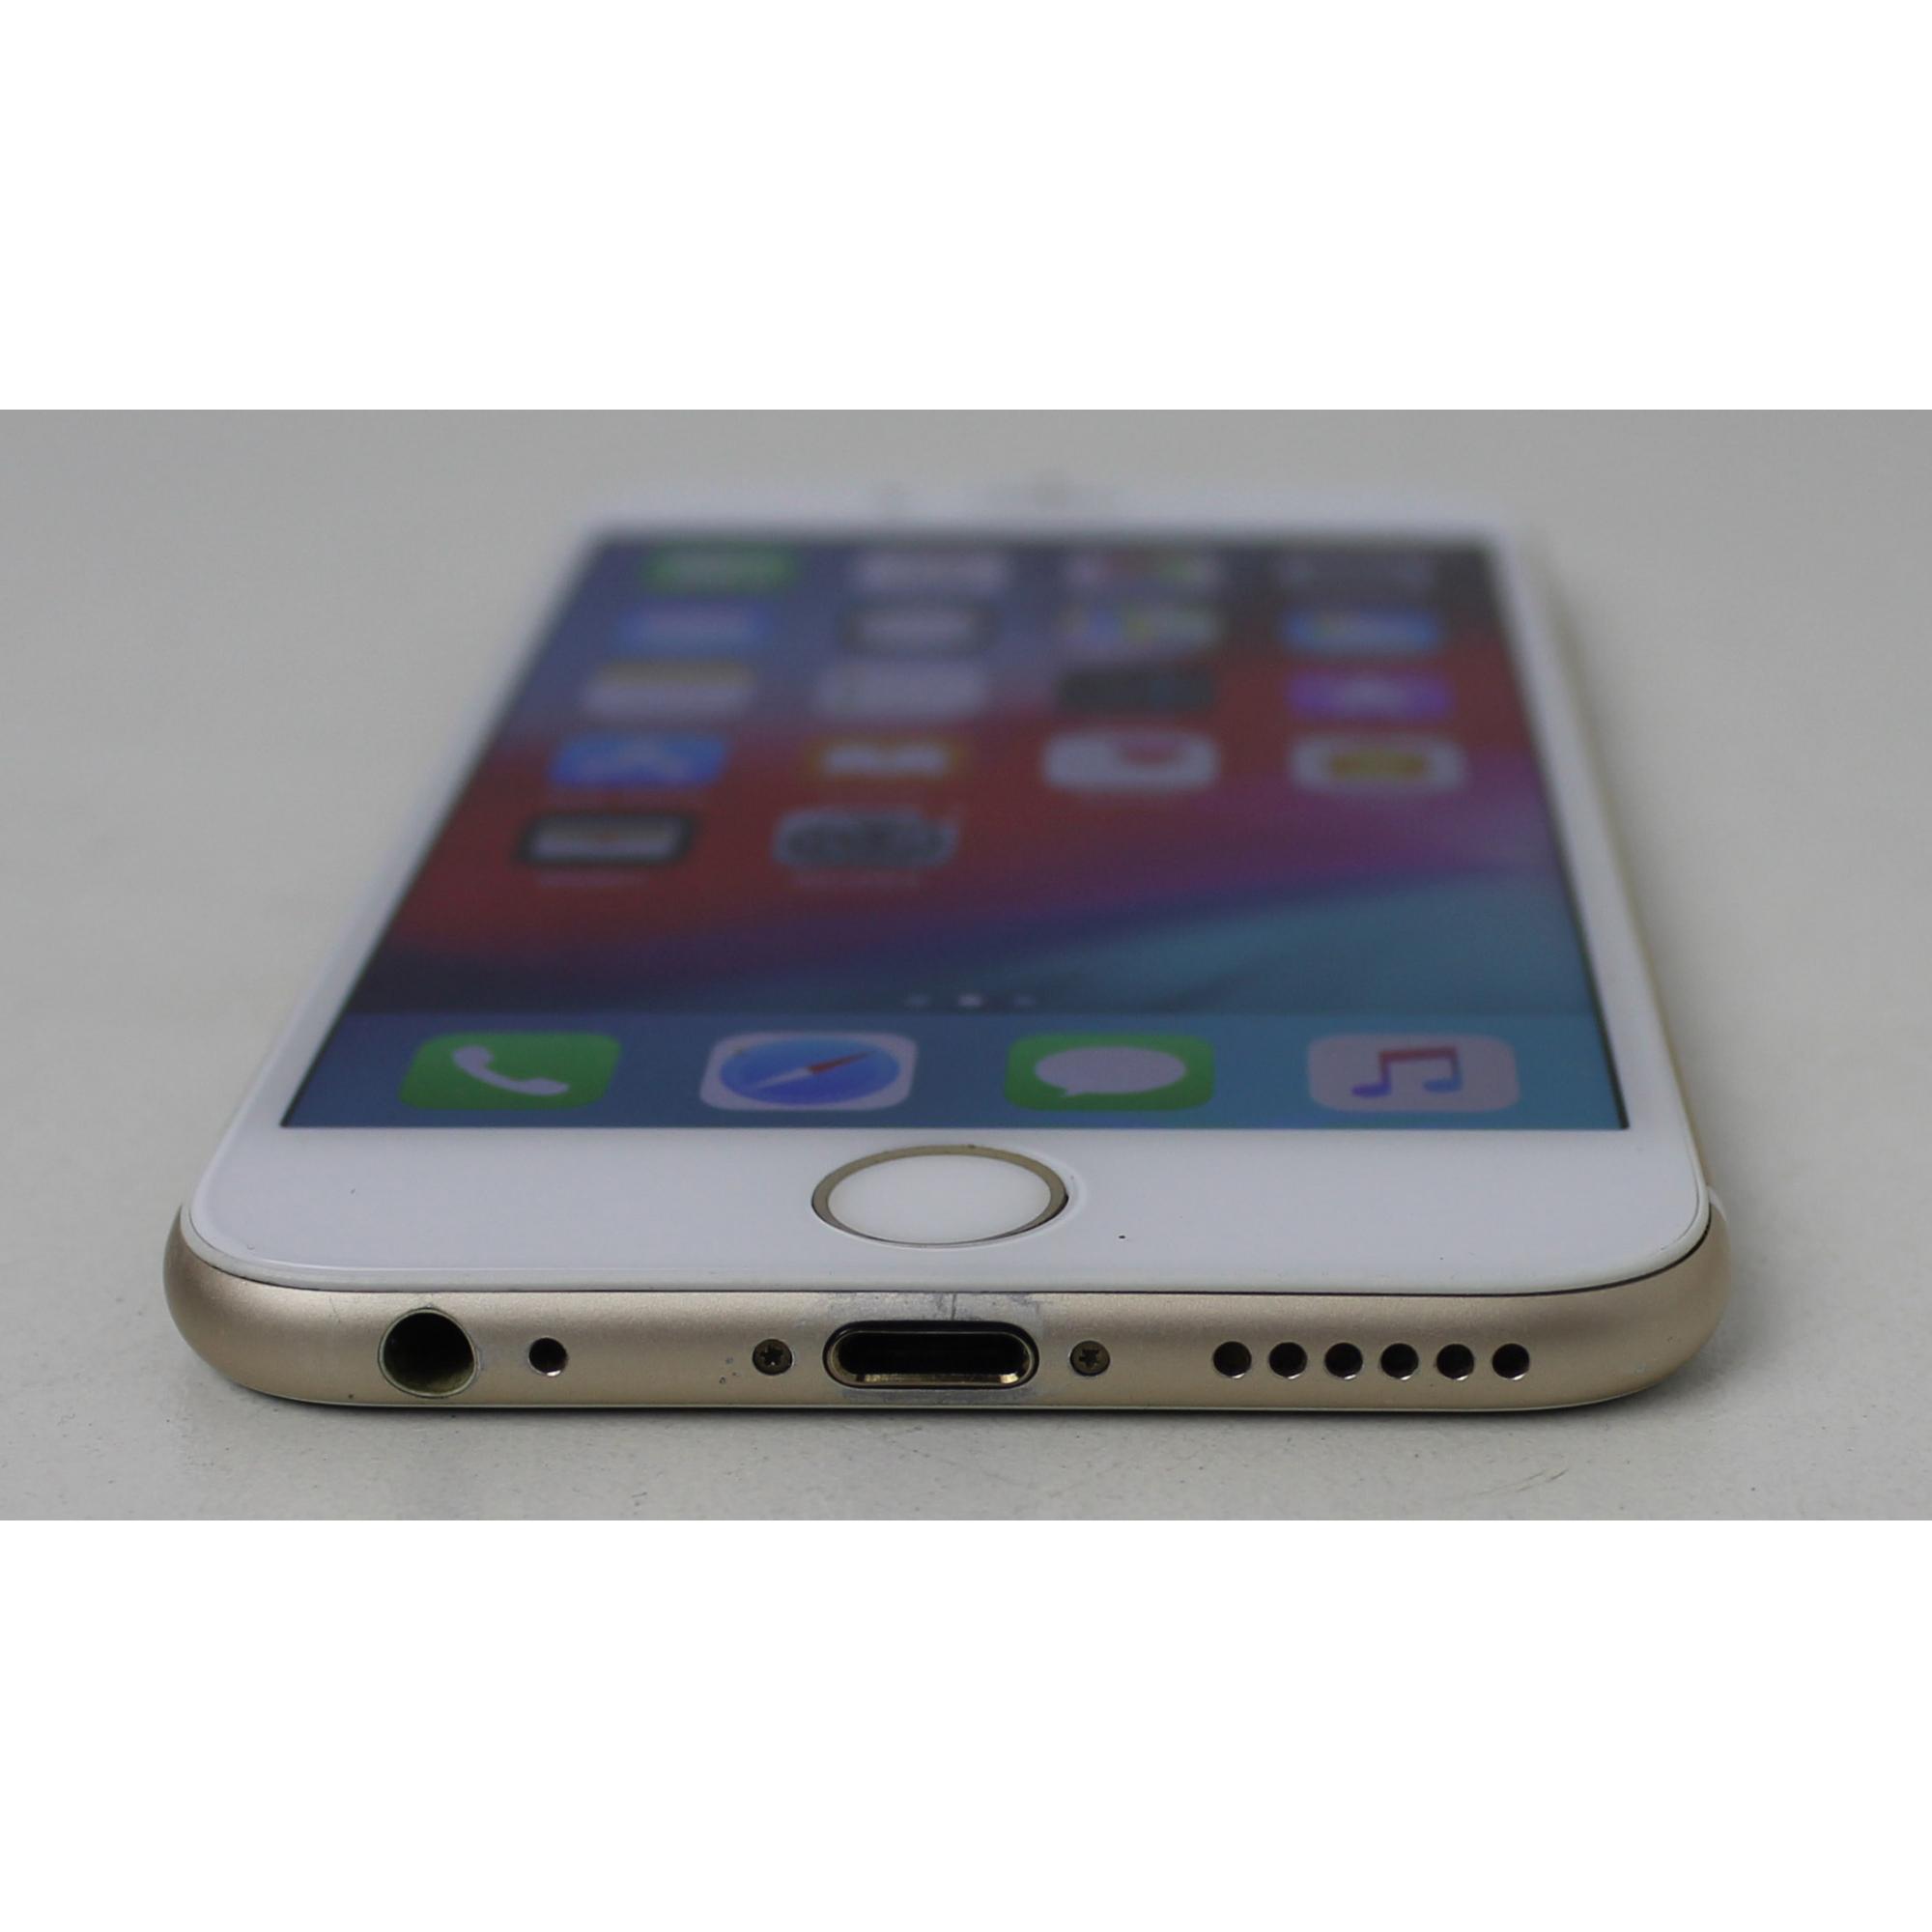 "IPHONE 6 MG652LL/A 4.7"" 64GB - GOLD"